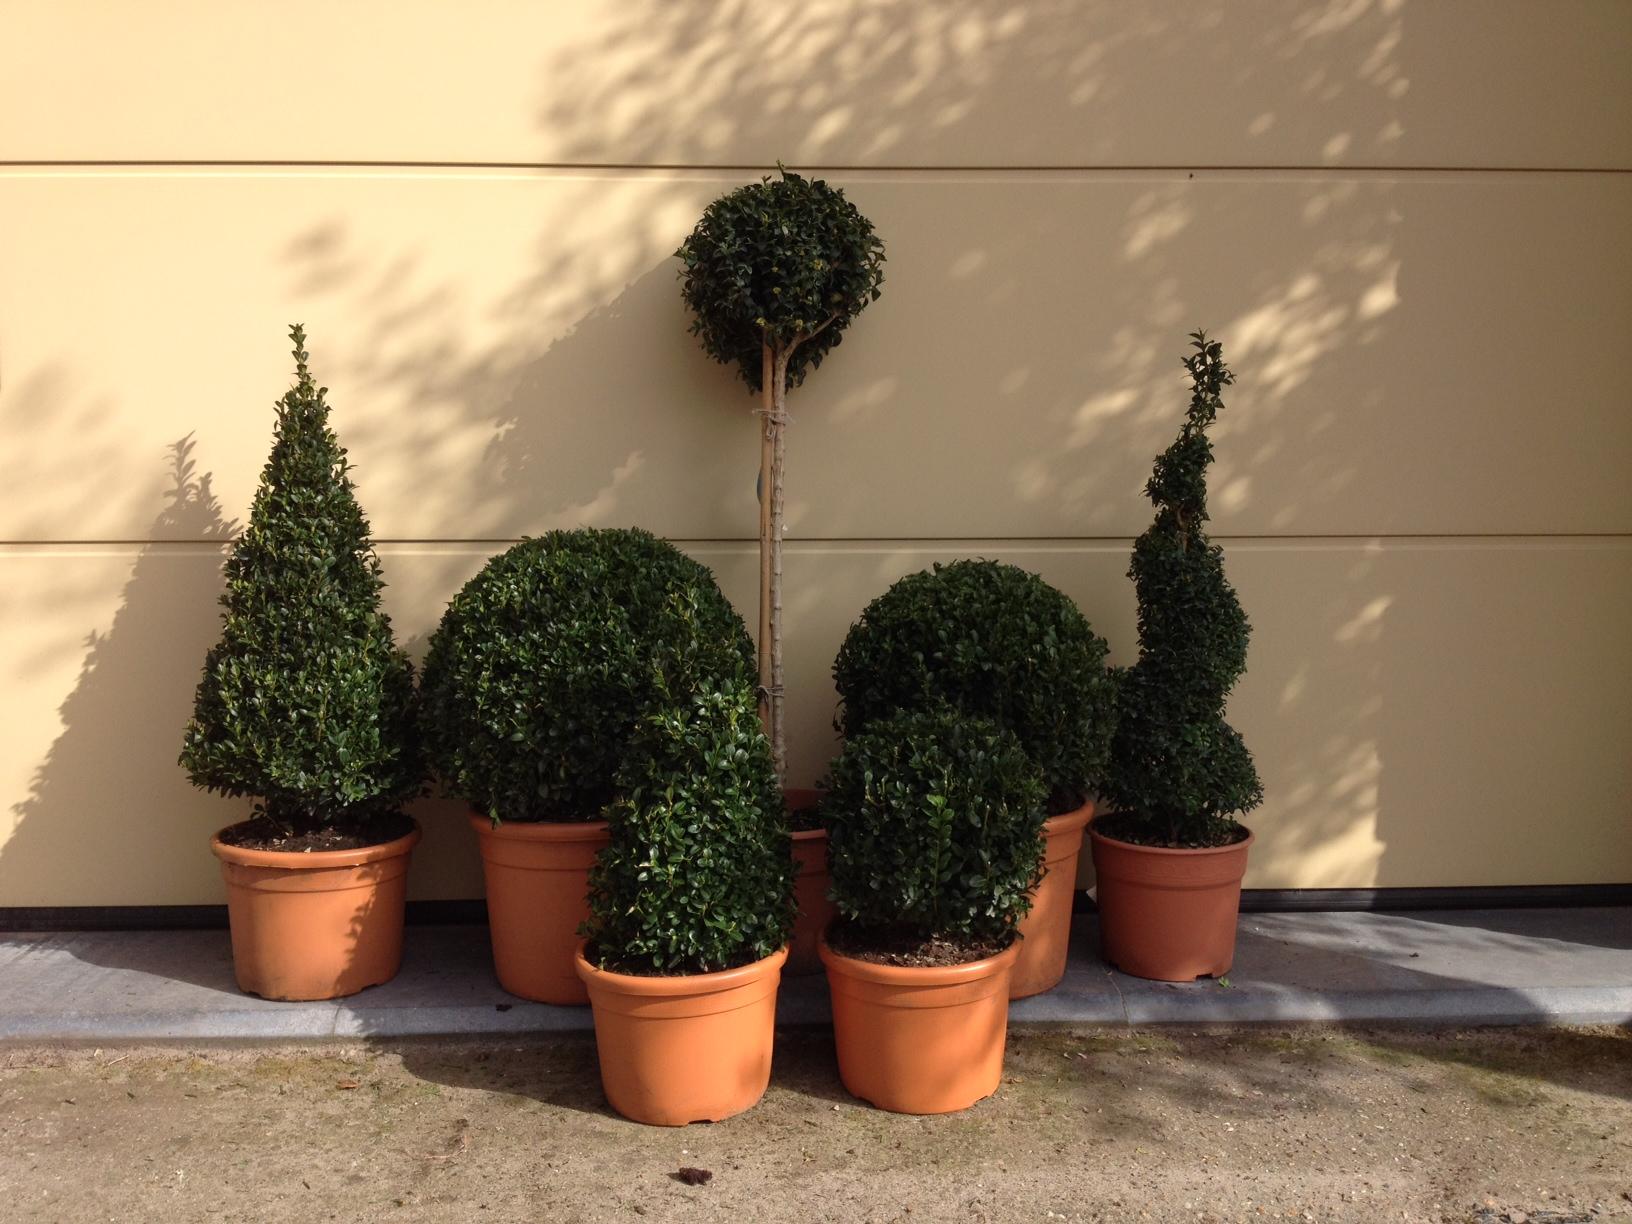 Buxus sempervirens - palm